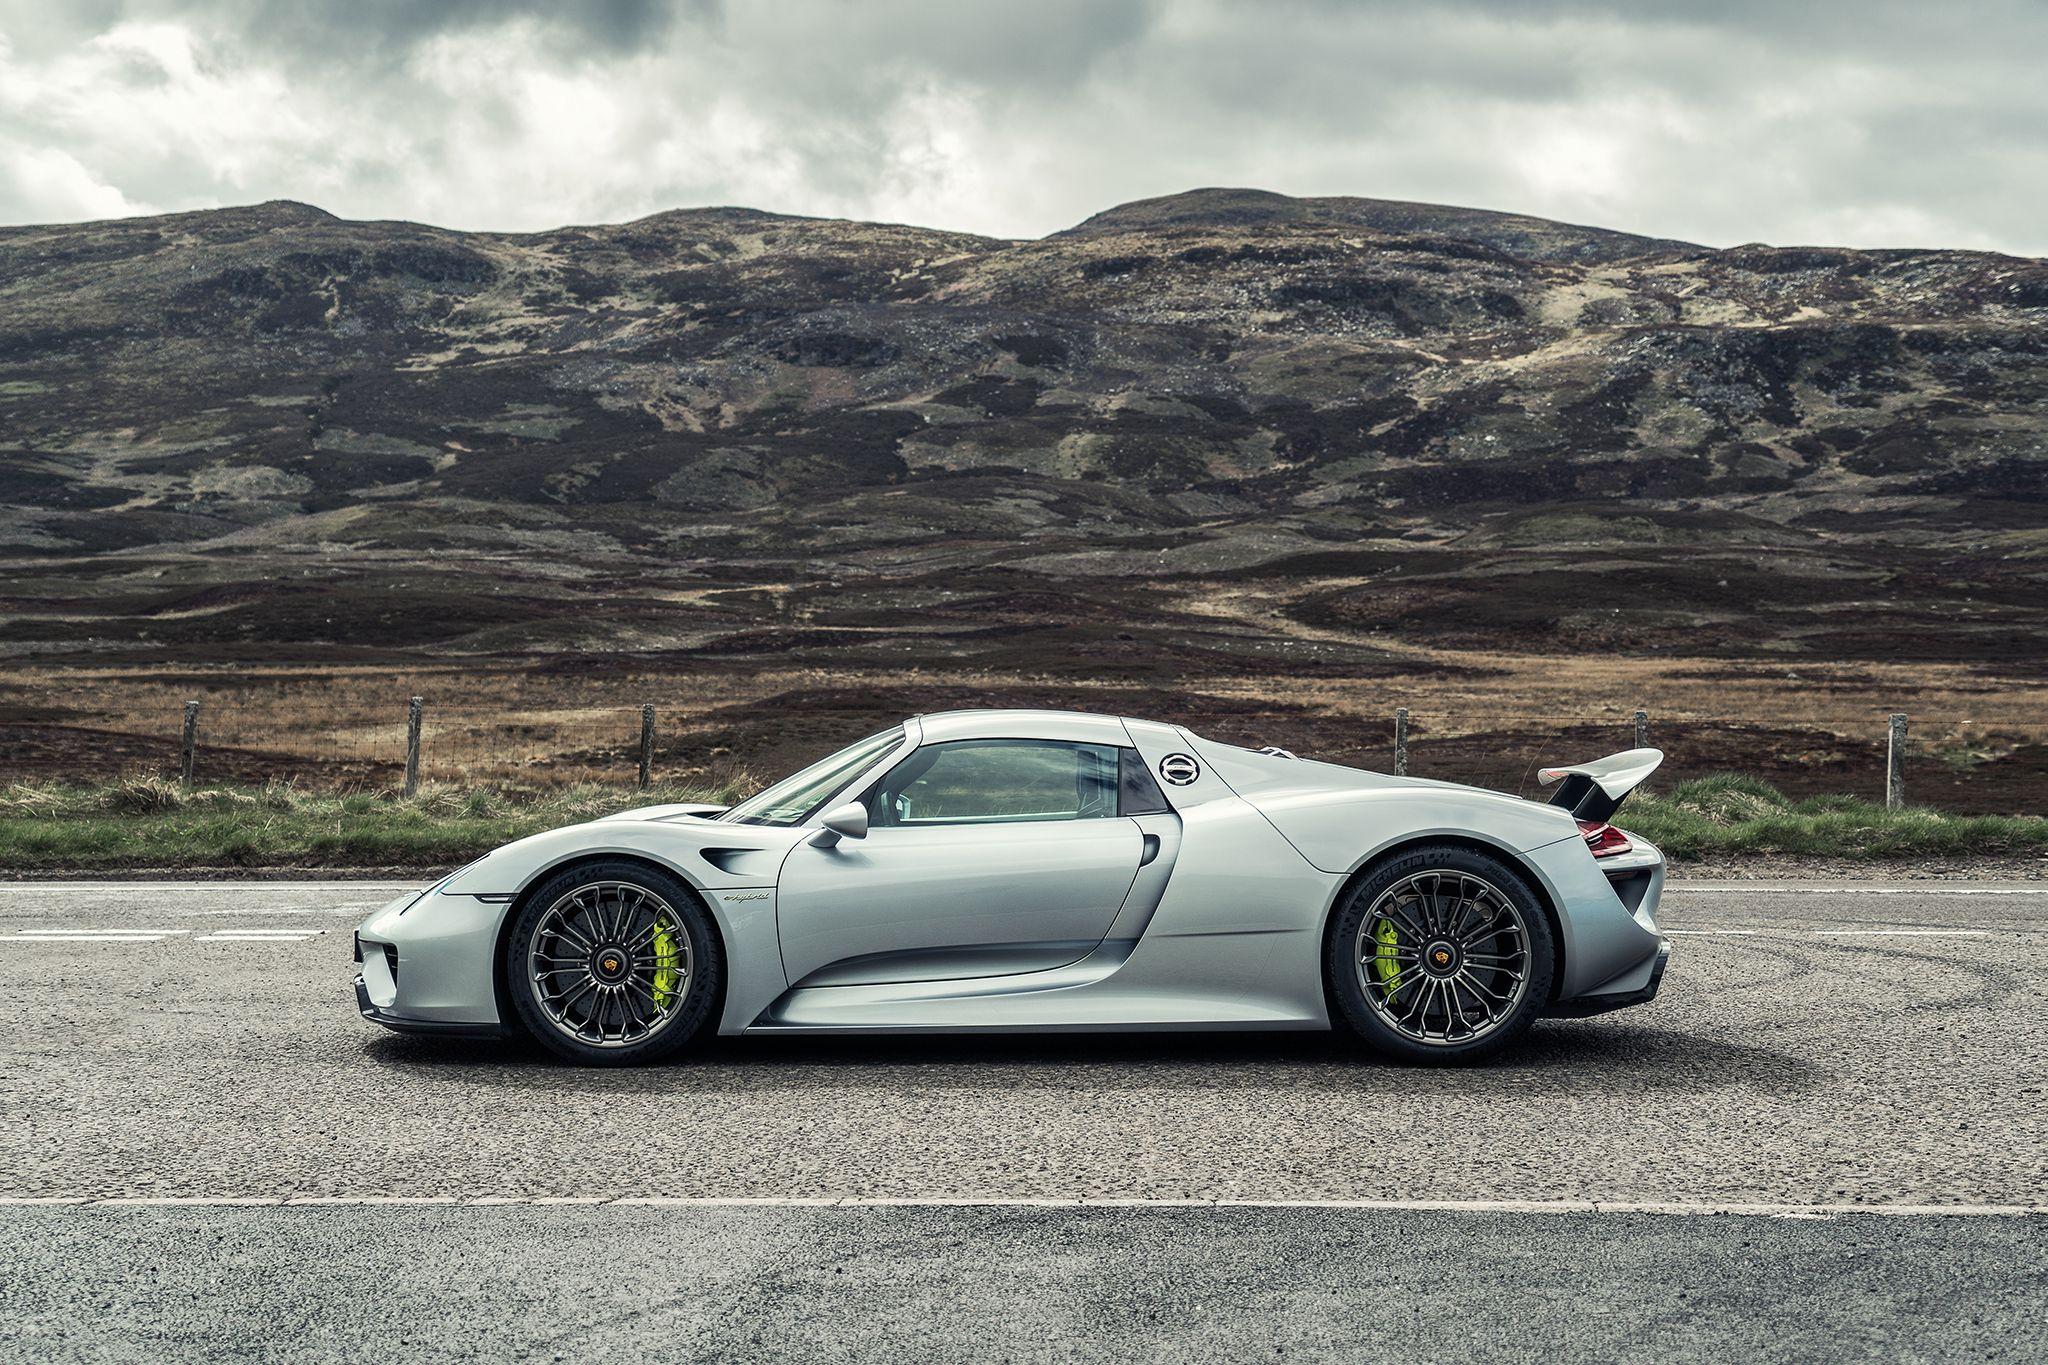 04d07e0c44b865b623444fb2f153a94e Remarkable Porsche 918 Spyder On the Road Cars Trend